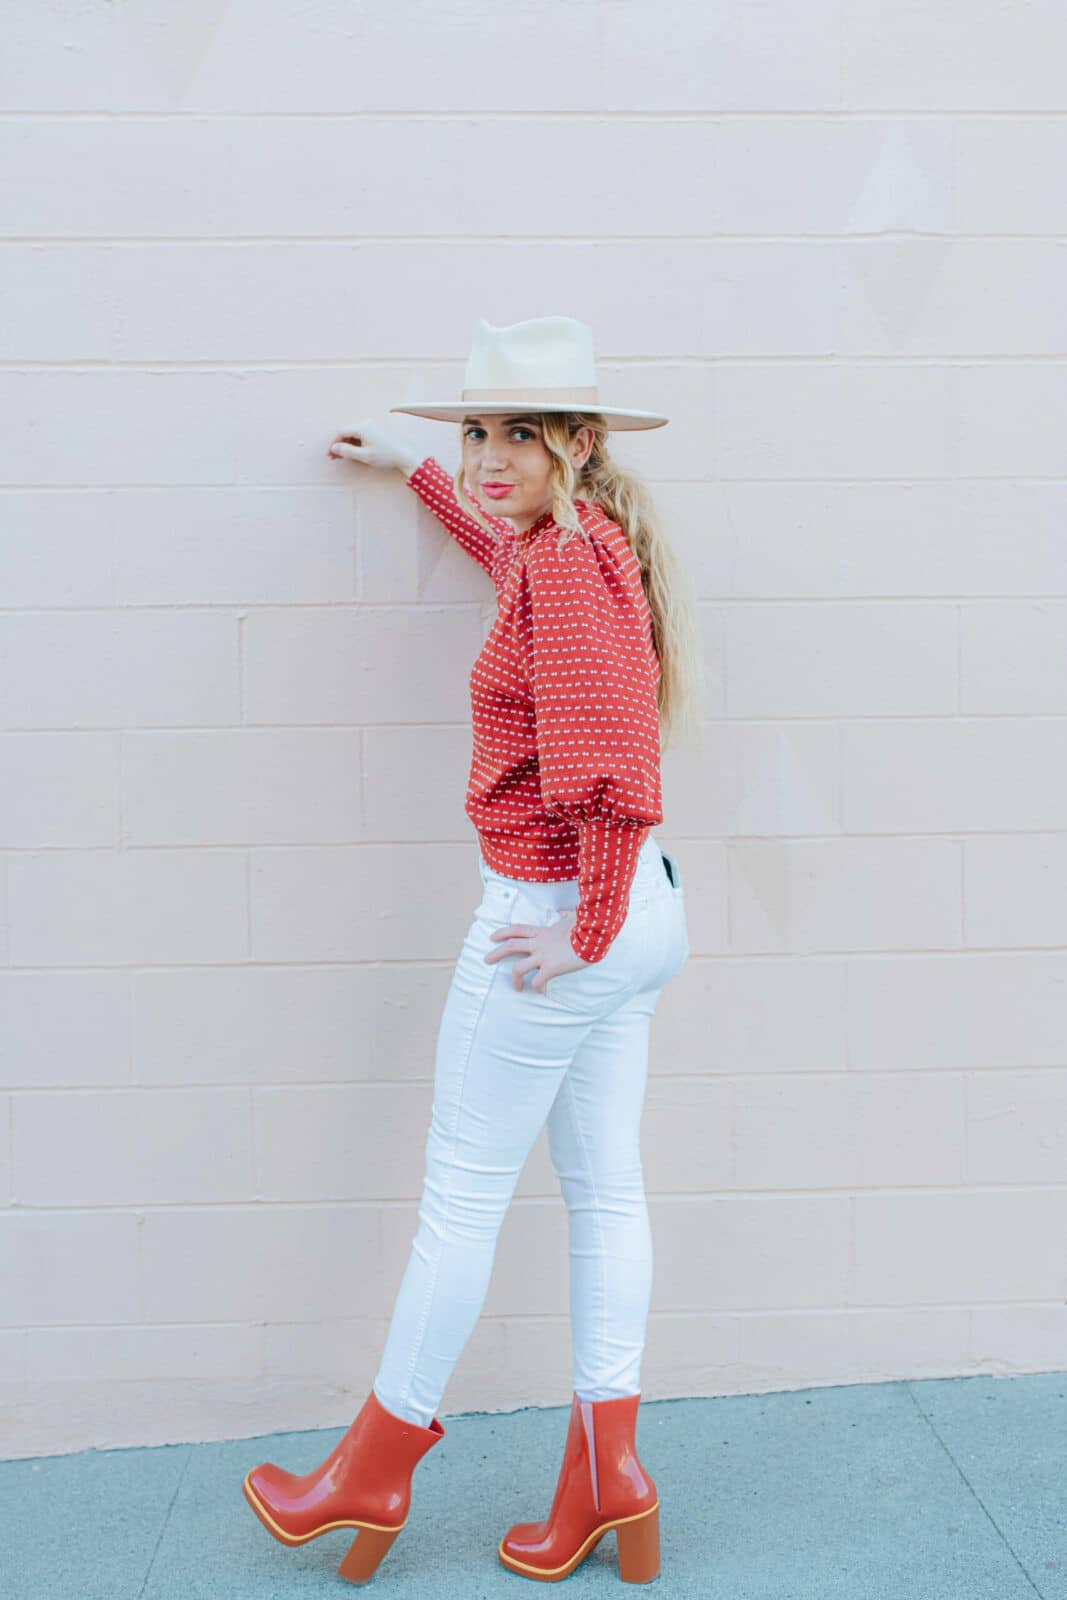 Los Angeles City Walls Blogger